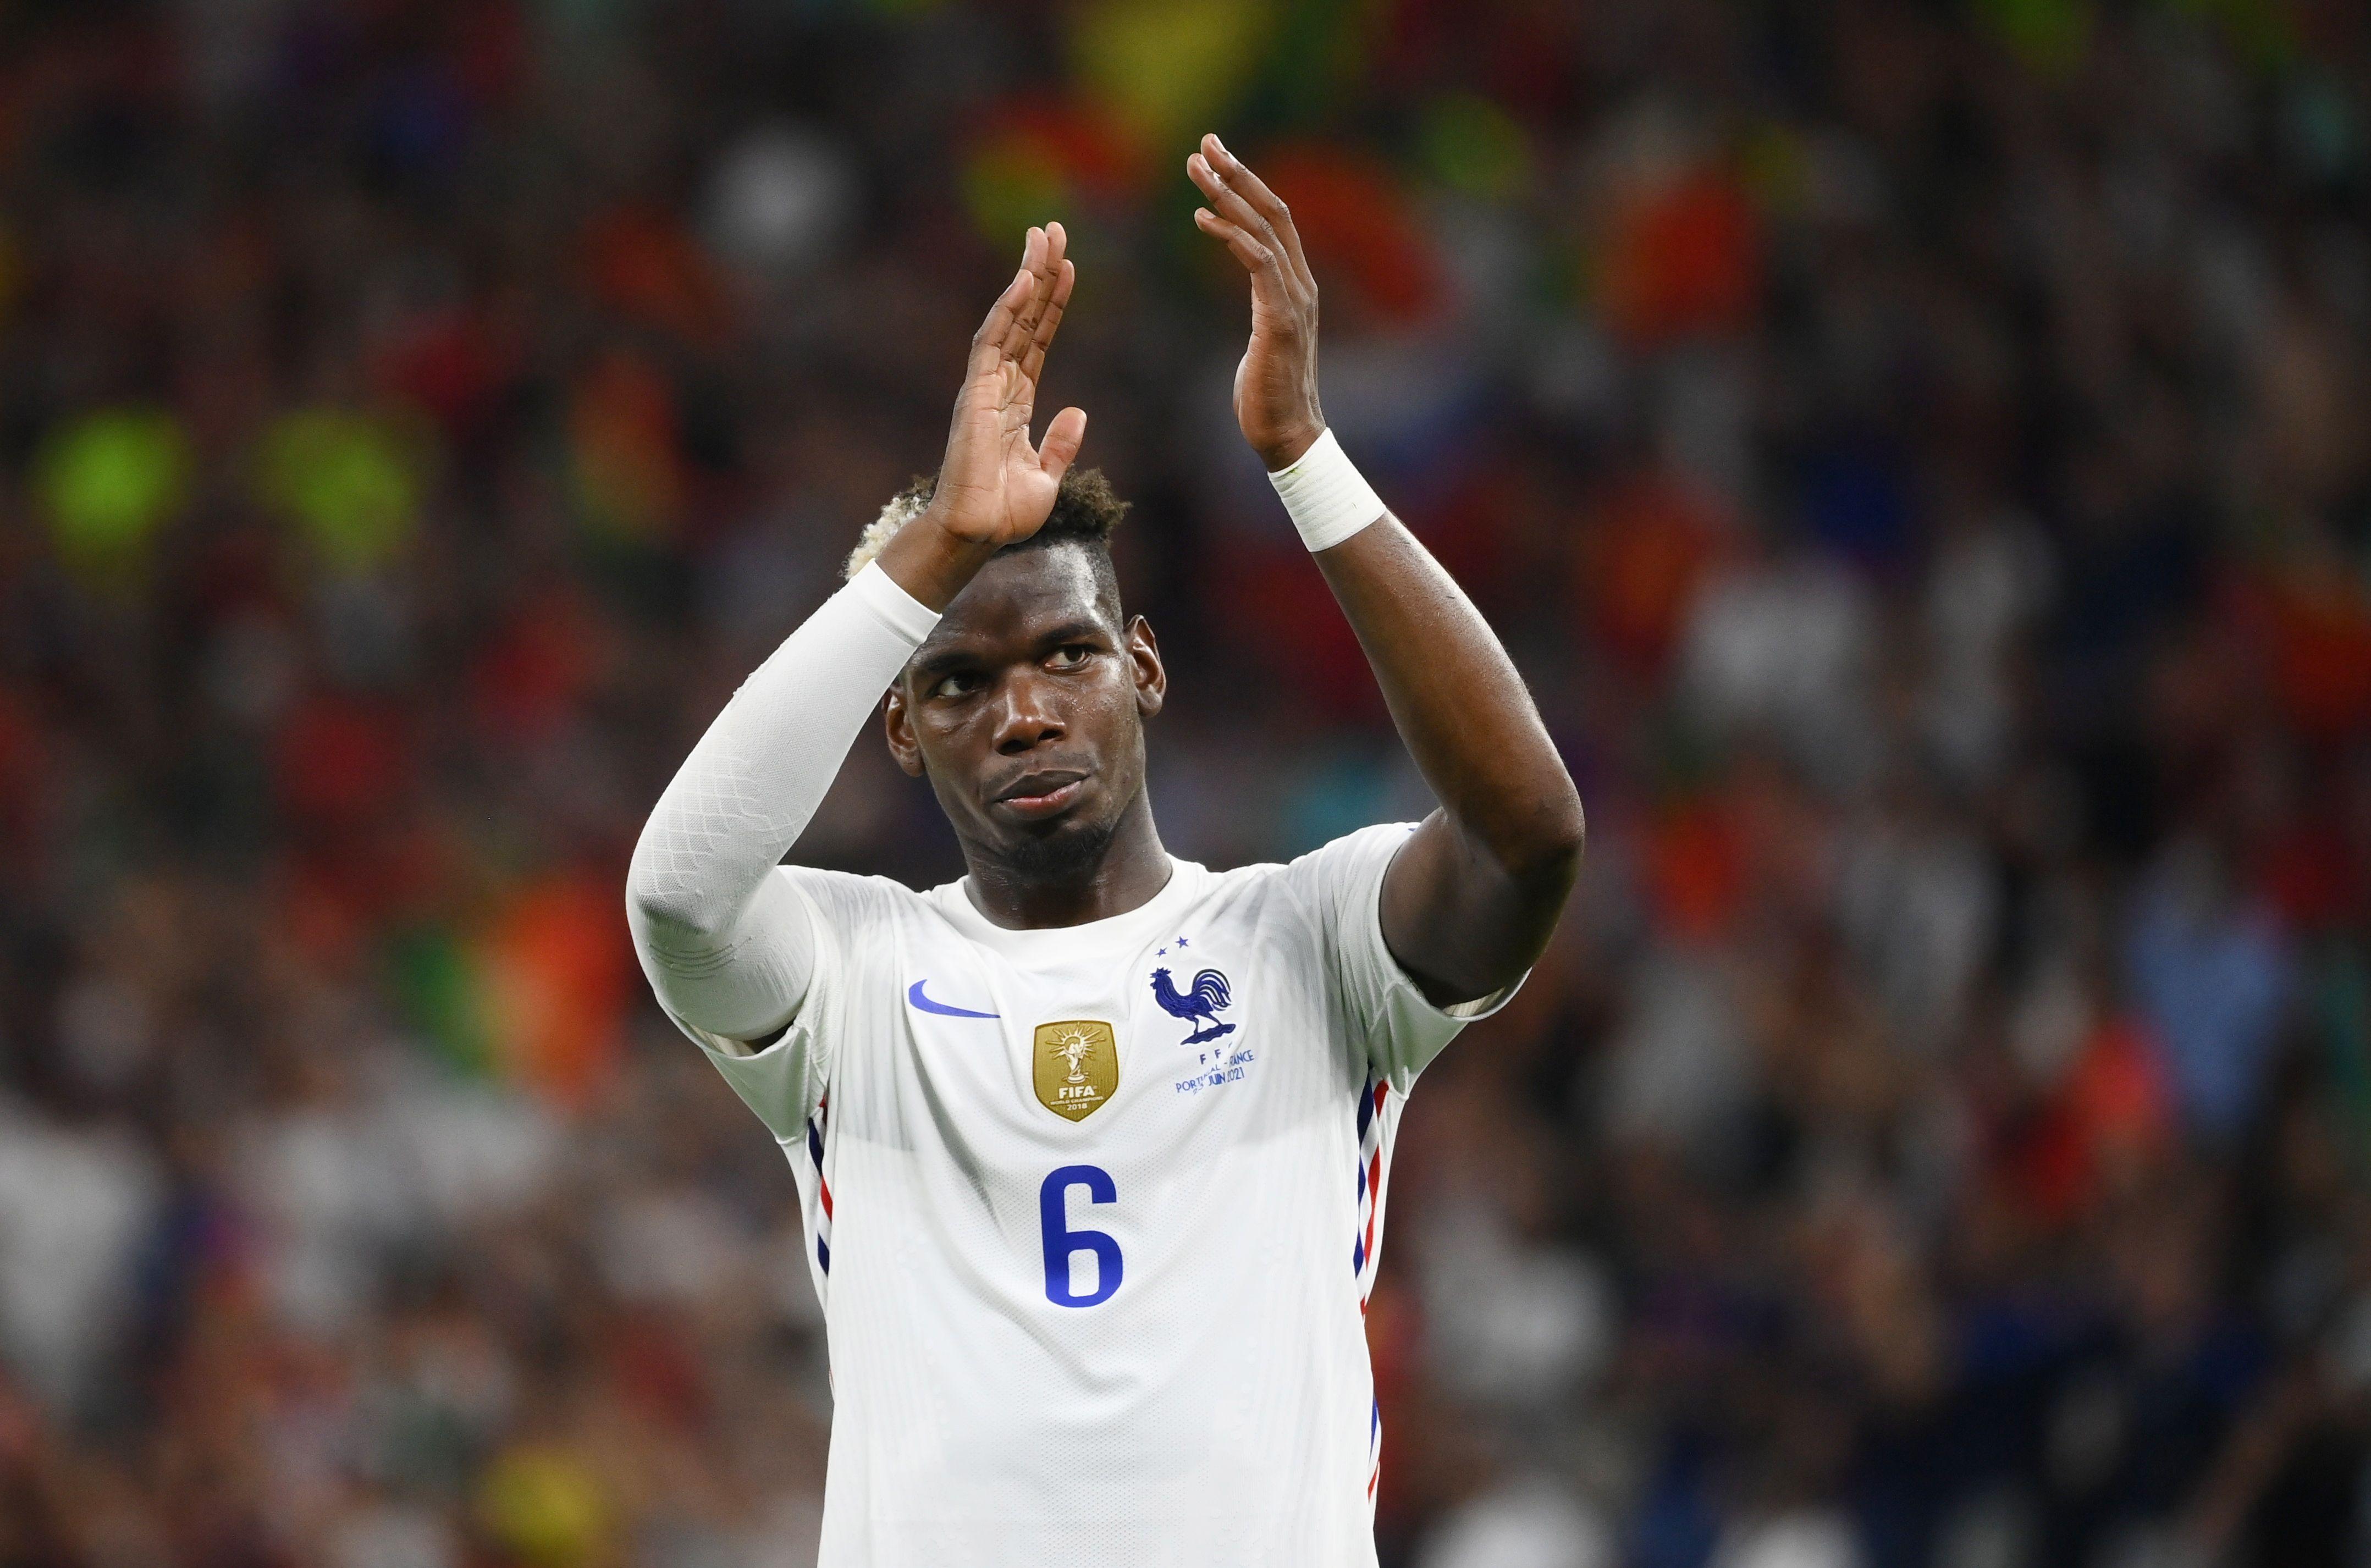 Paul Pogba viene de destacarse en la Eurocopa (REUTERS/Franck Fife)